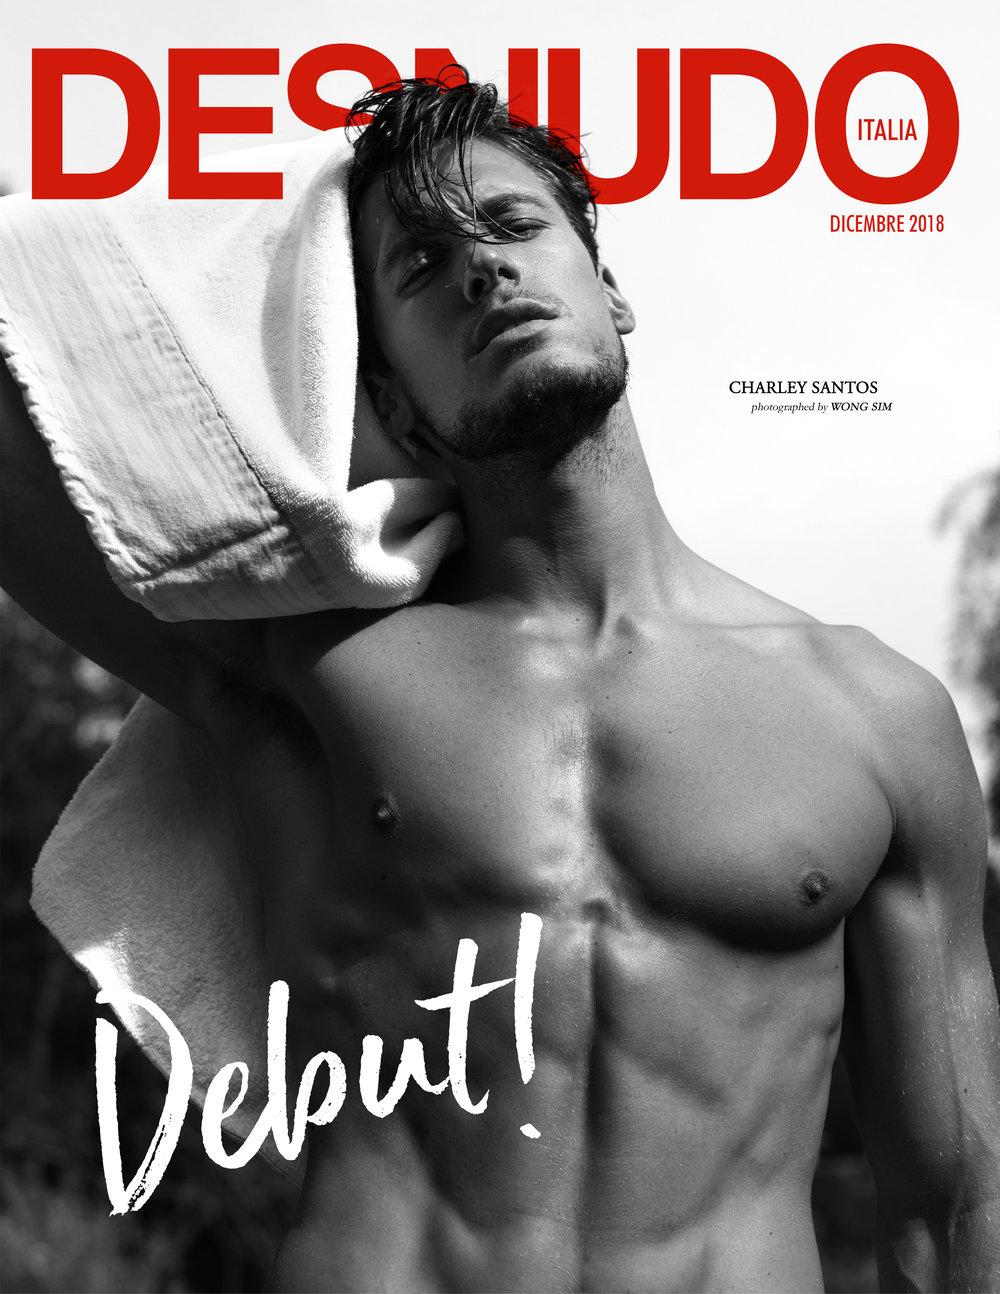 Desnudo Italia Issue 1